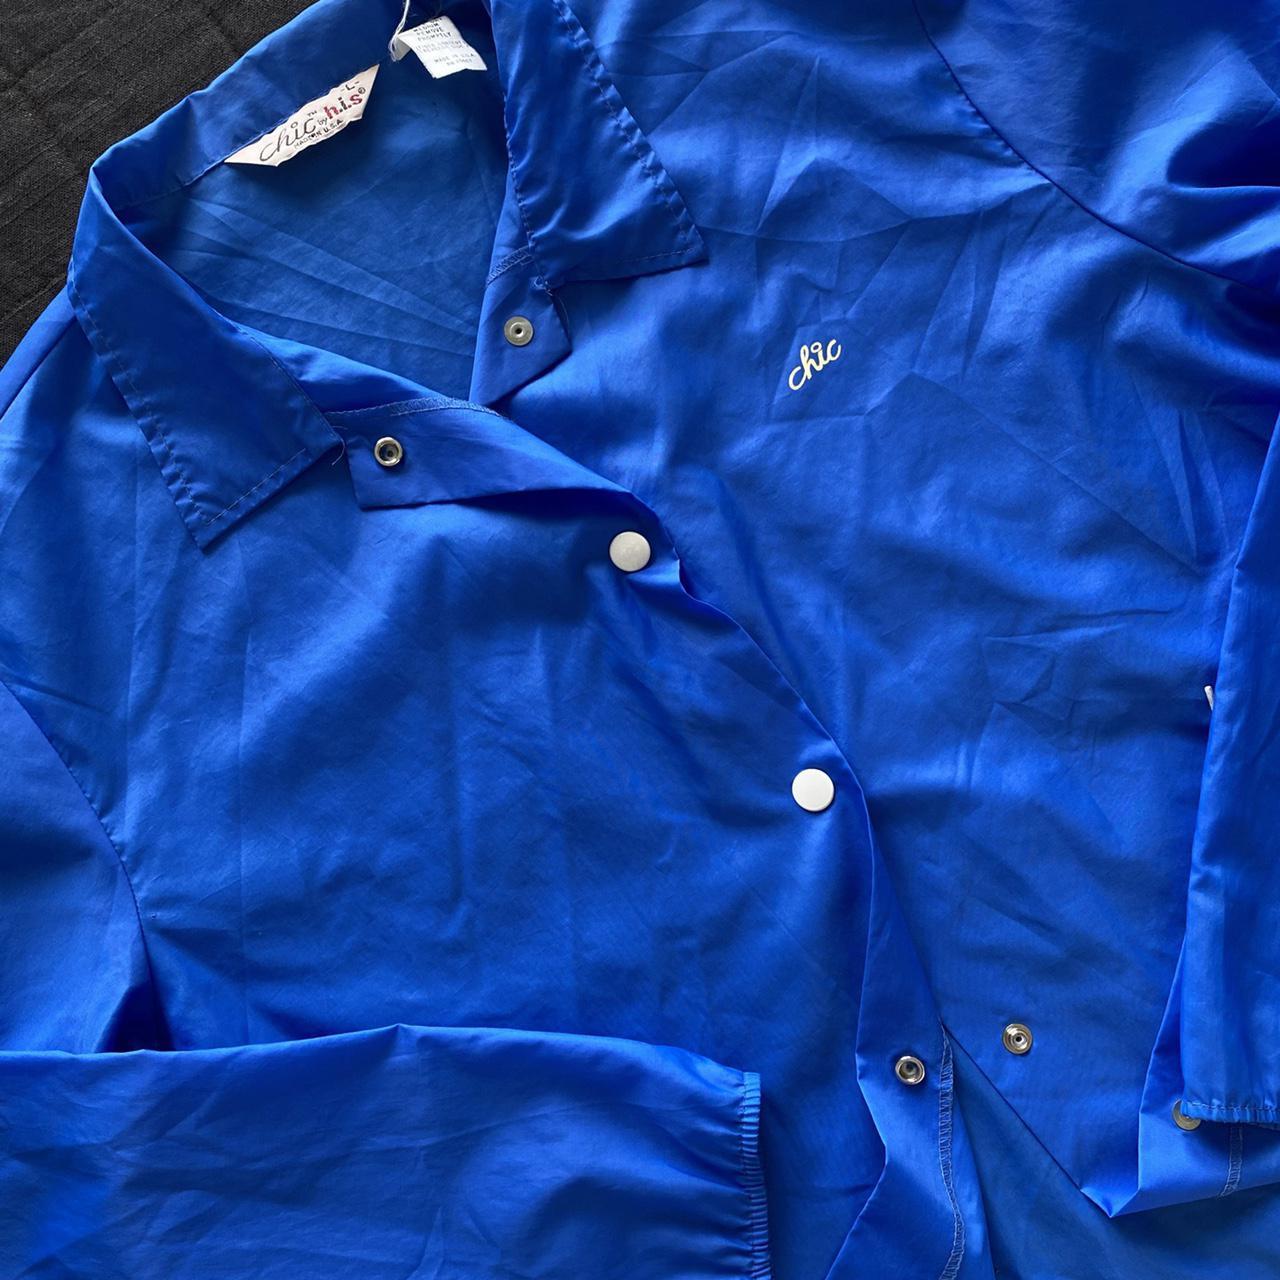 Product Image 1 - Vintage Chic coach jacket windbreaker.